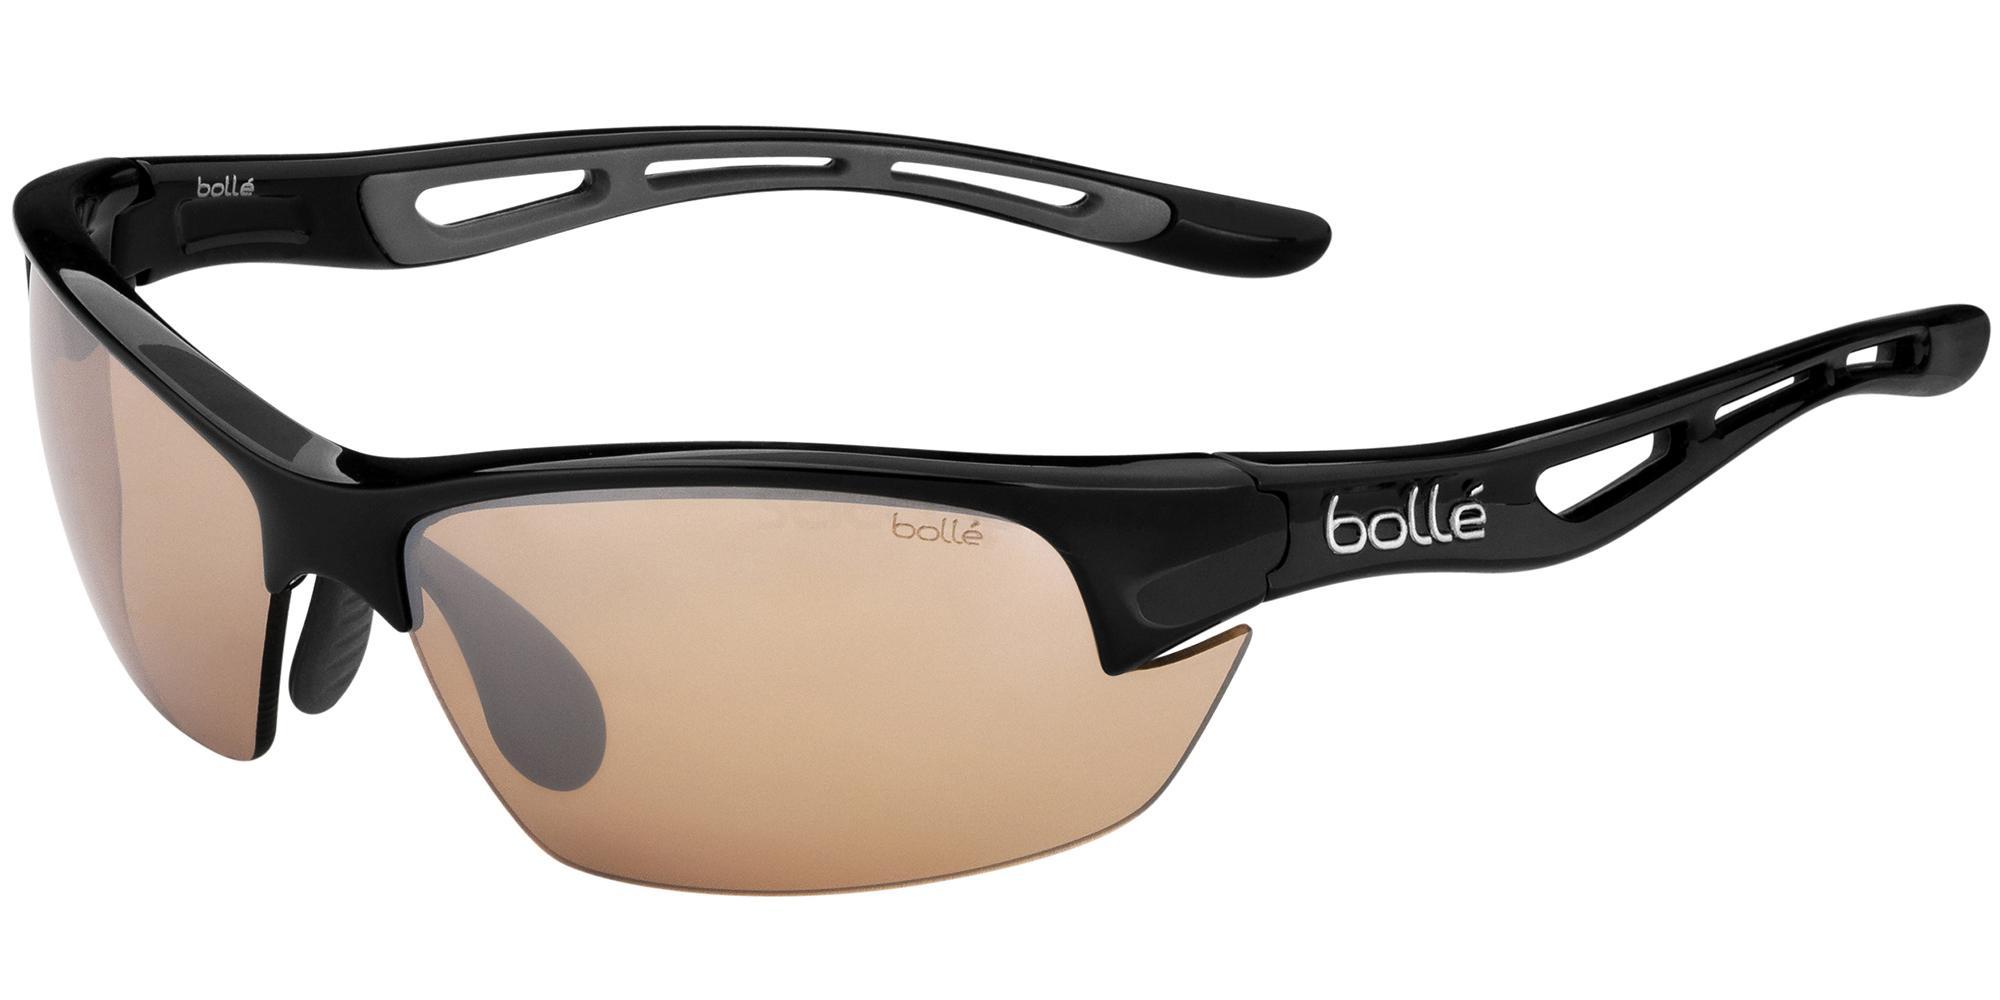 11781 Bolt S Sunglasses, Bolle